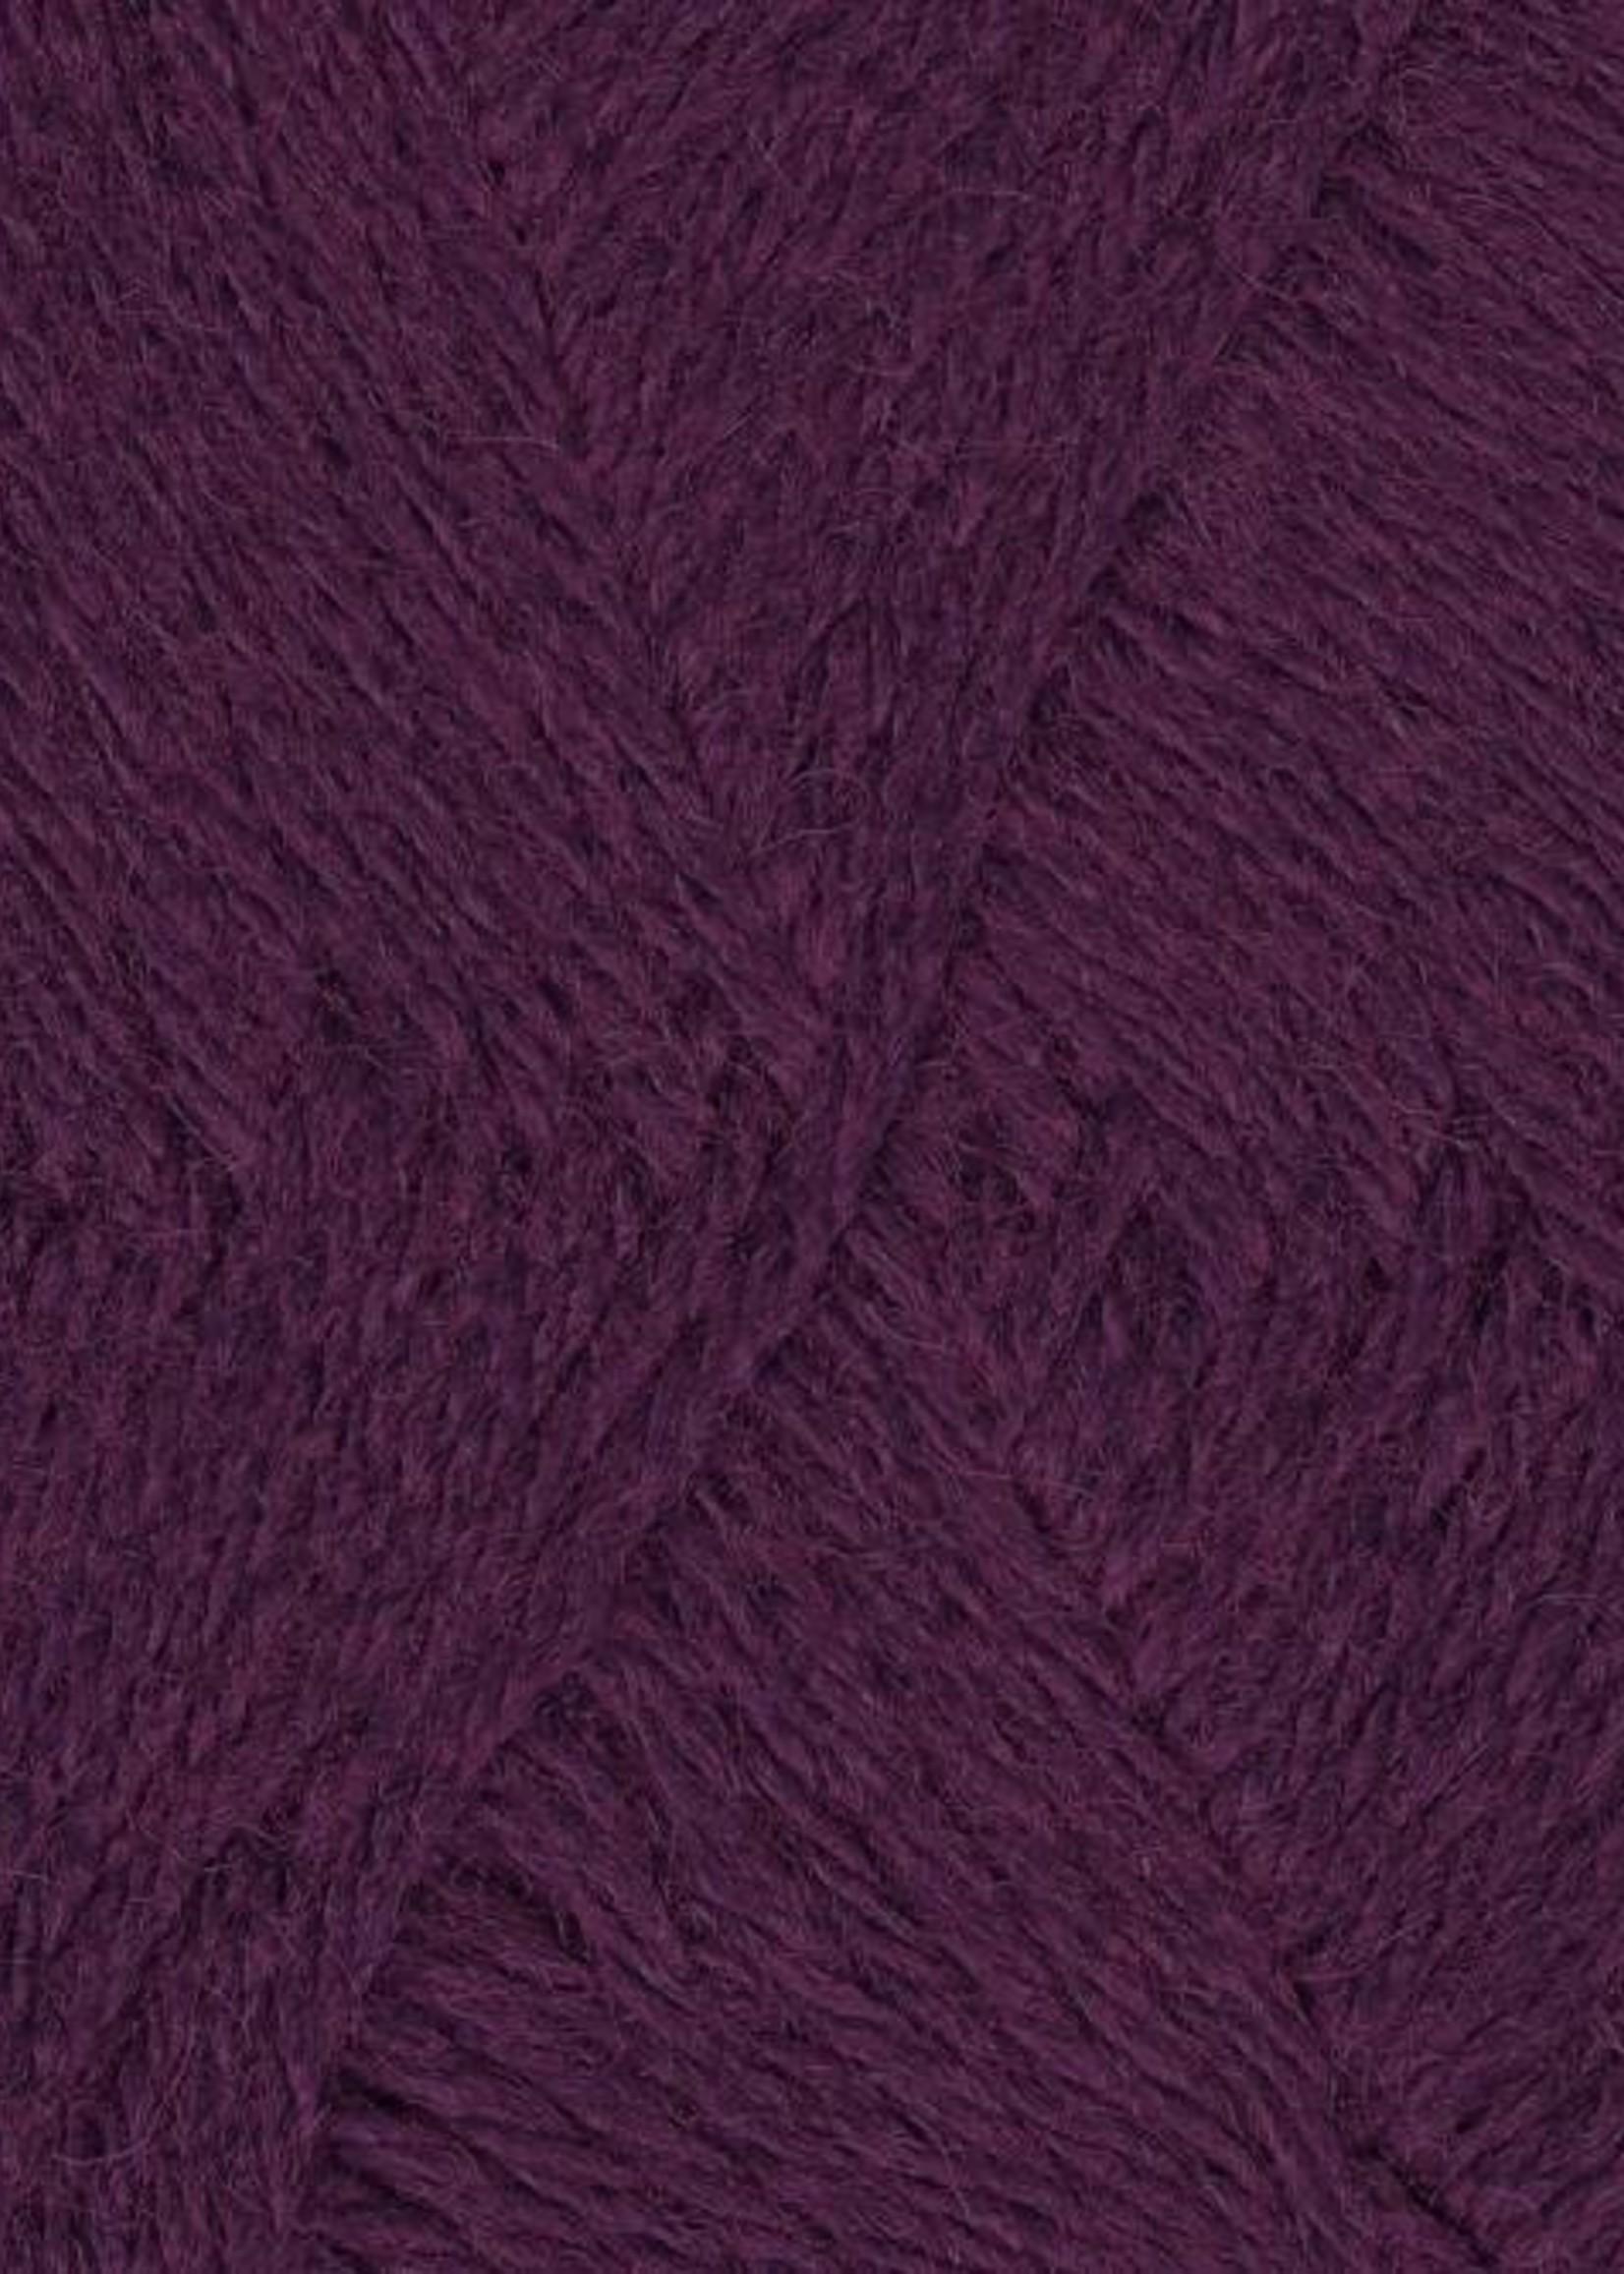 Knitting Fever KFI Collection Teenie Weenie Wool - Plum